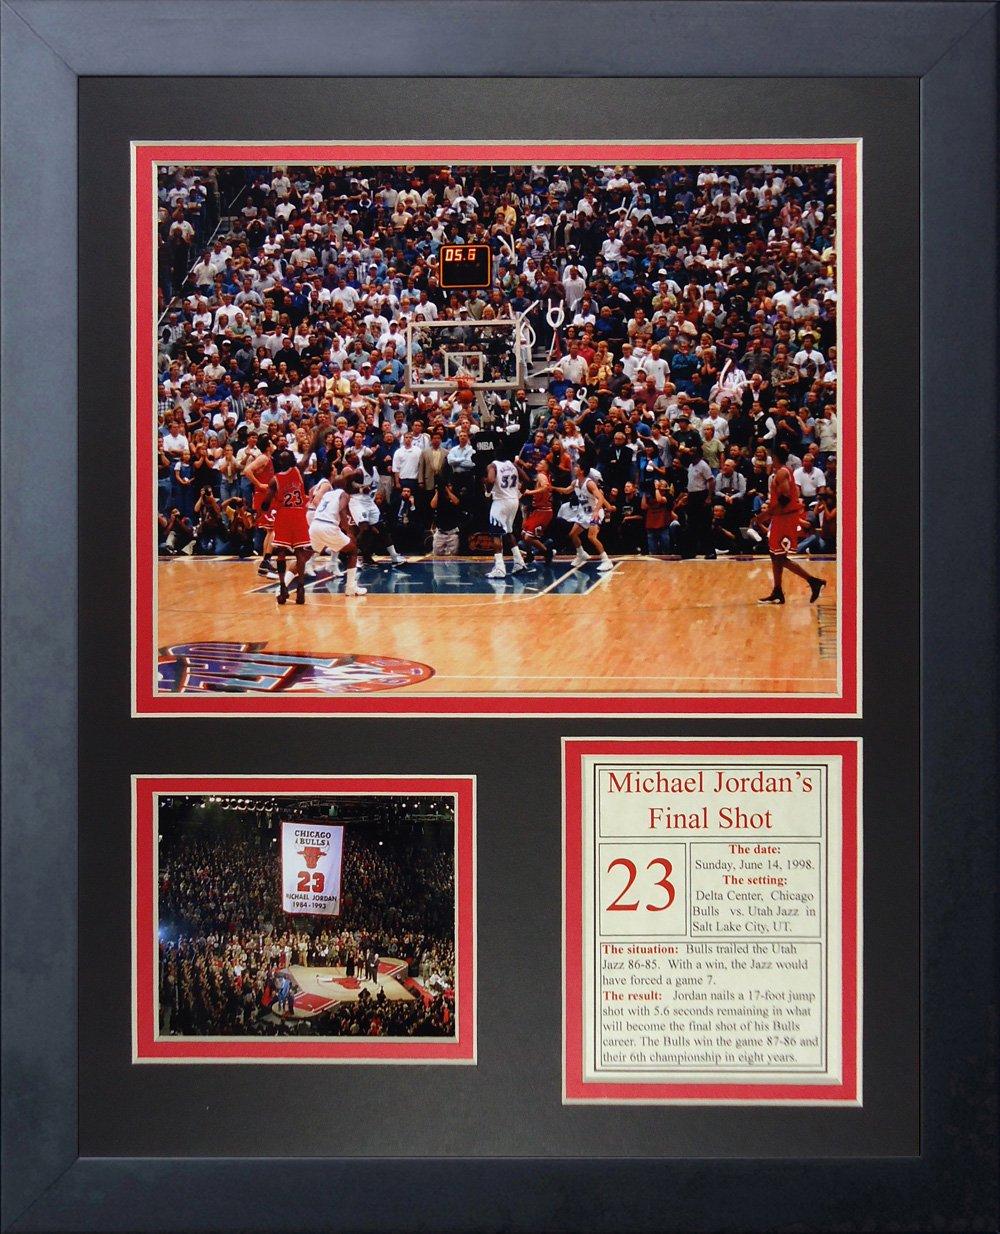 Legends Never Die ''Michael Jordan Final Shot Framed Photo Collage, 11 x 14-Inch by Legends Never Die